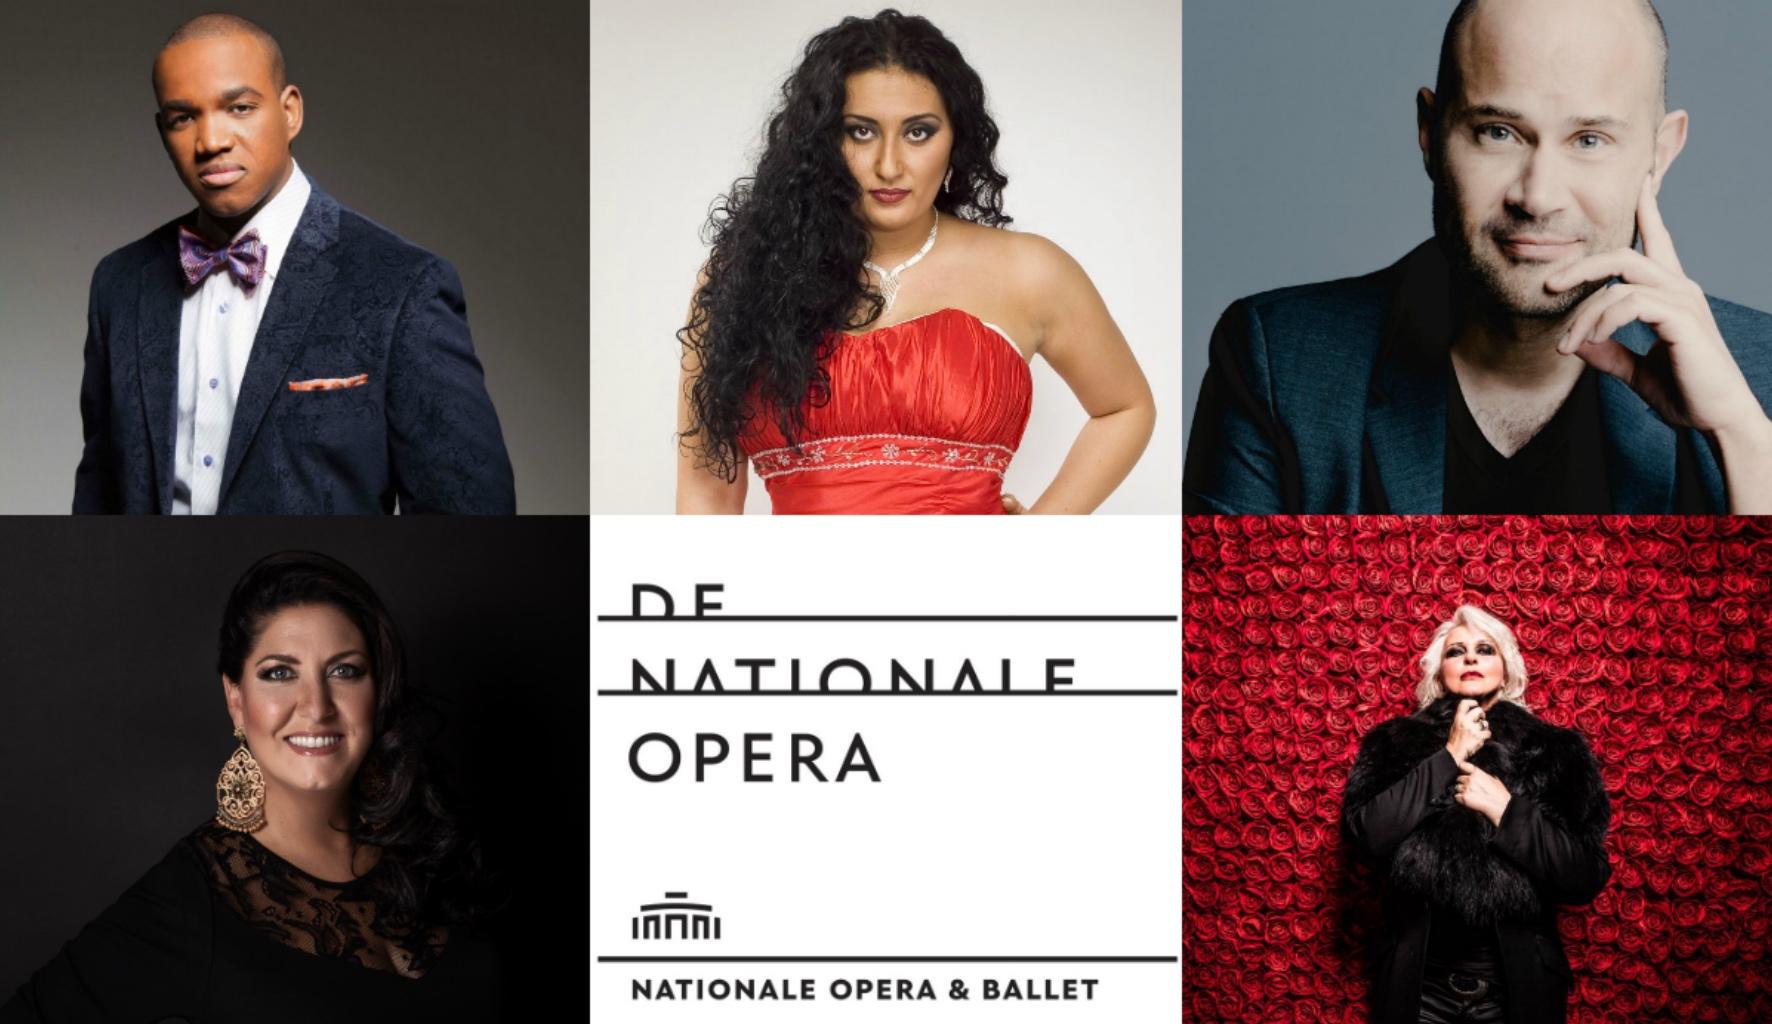 De Nationale Opera Amsterdam 19/20; Anna Pirozzi, Anita Rachvelishvili; Lawrence Brownlee; Bejun Mehta; Irene Théorin; Eleonora Buratto